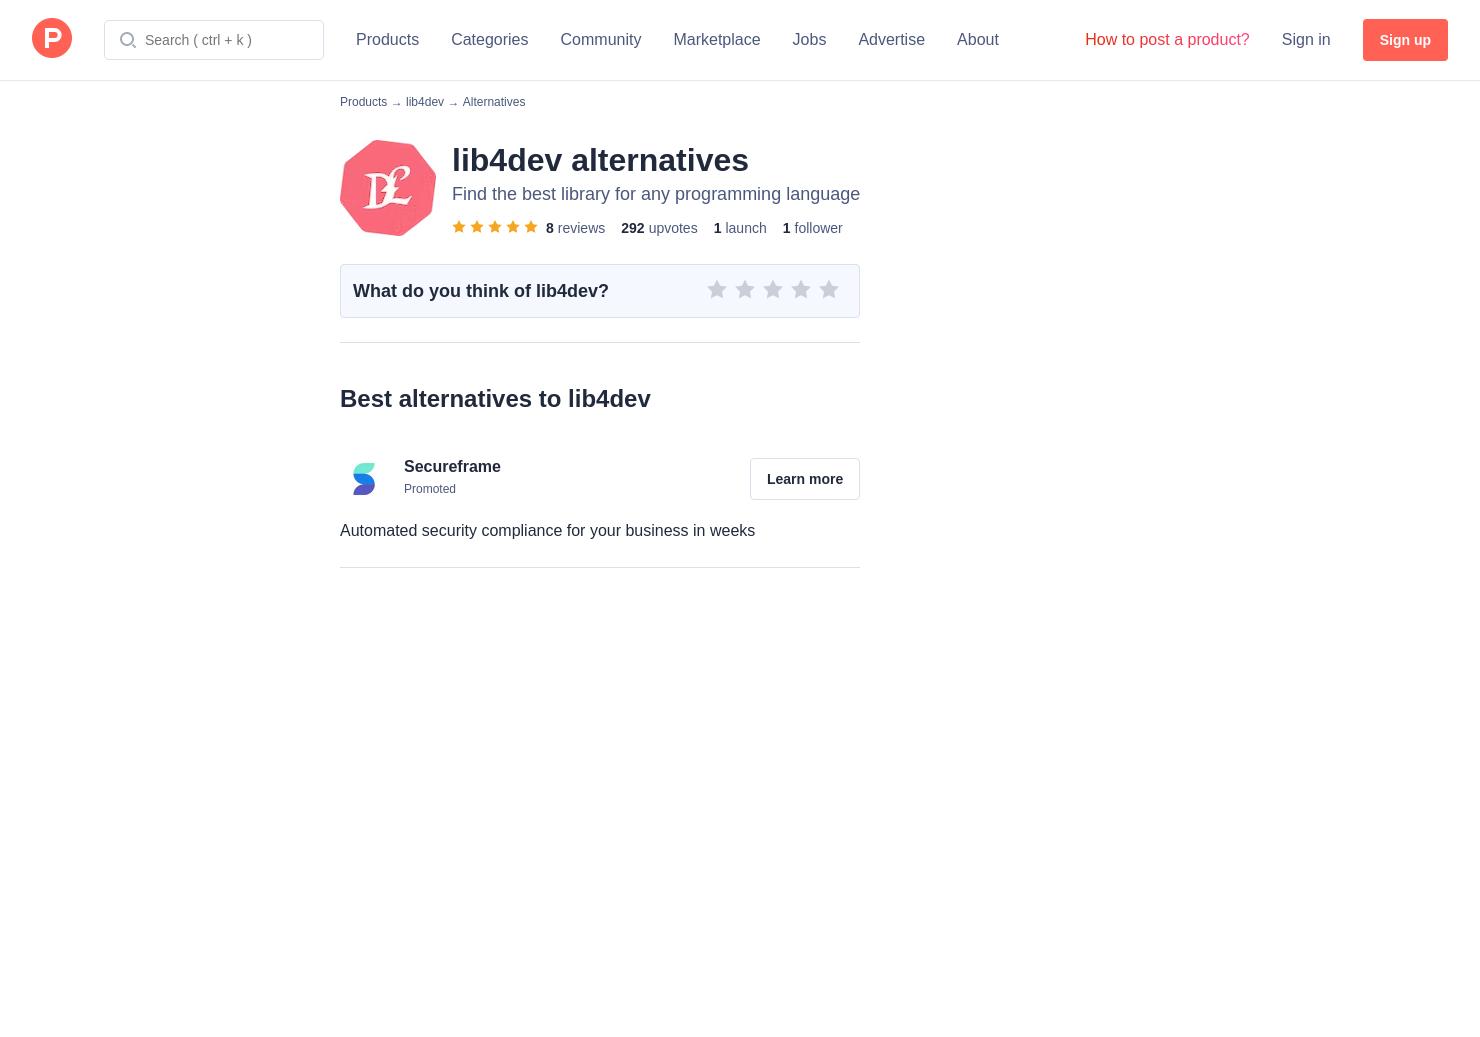 8 Alternatives to lib4dev | Product Hunt